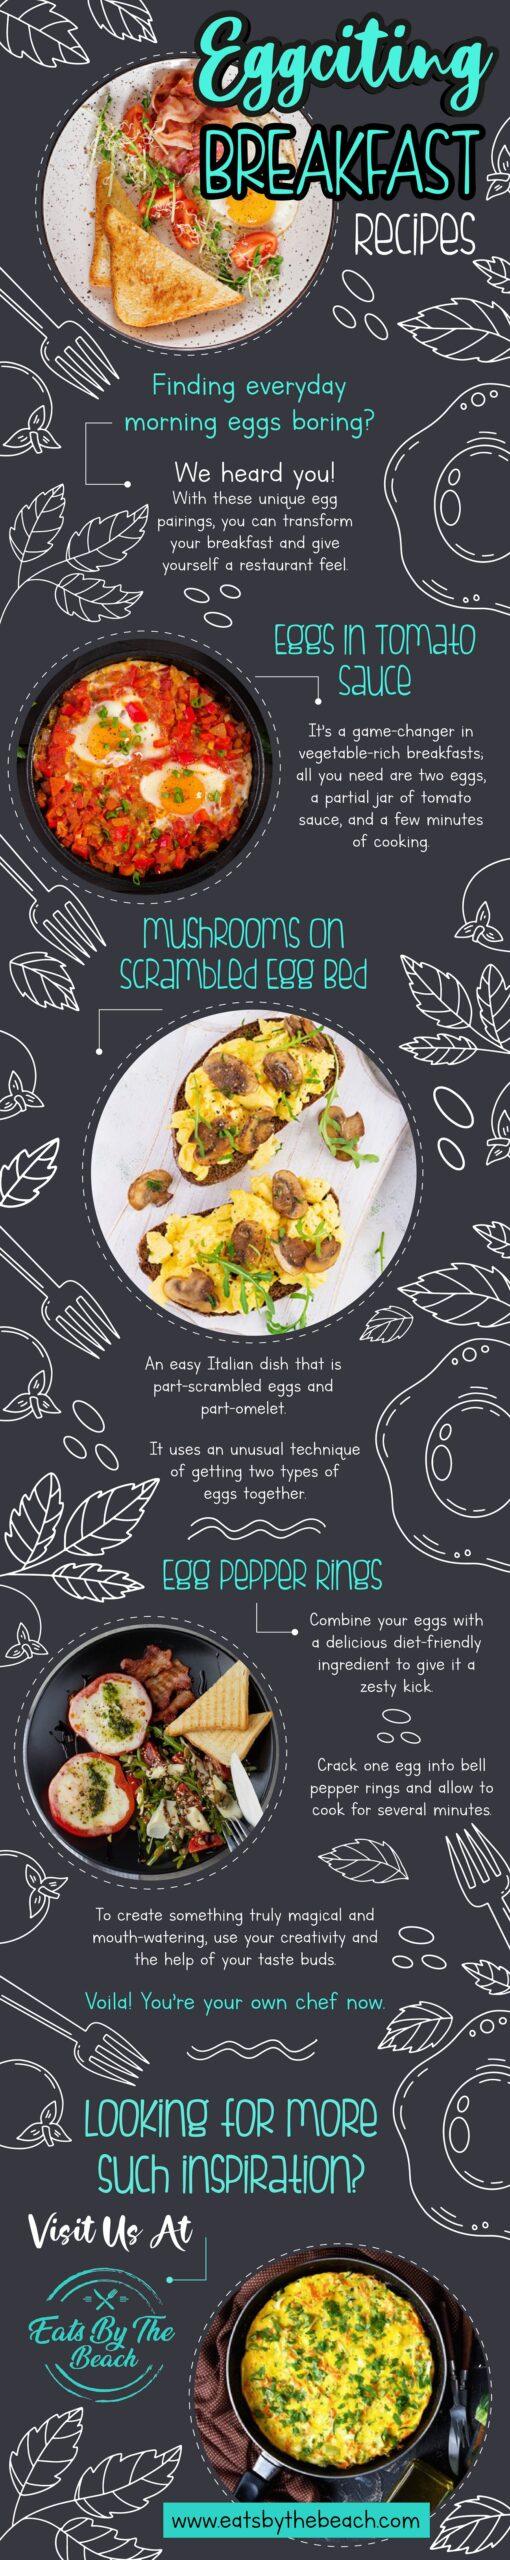 Eggciting breakfast recipes